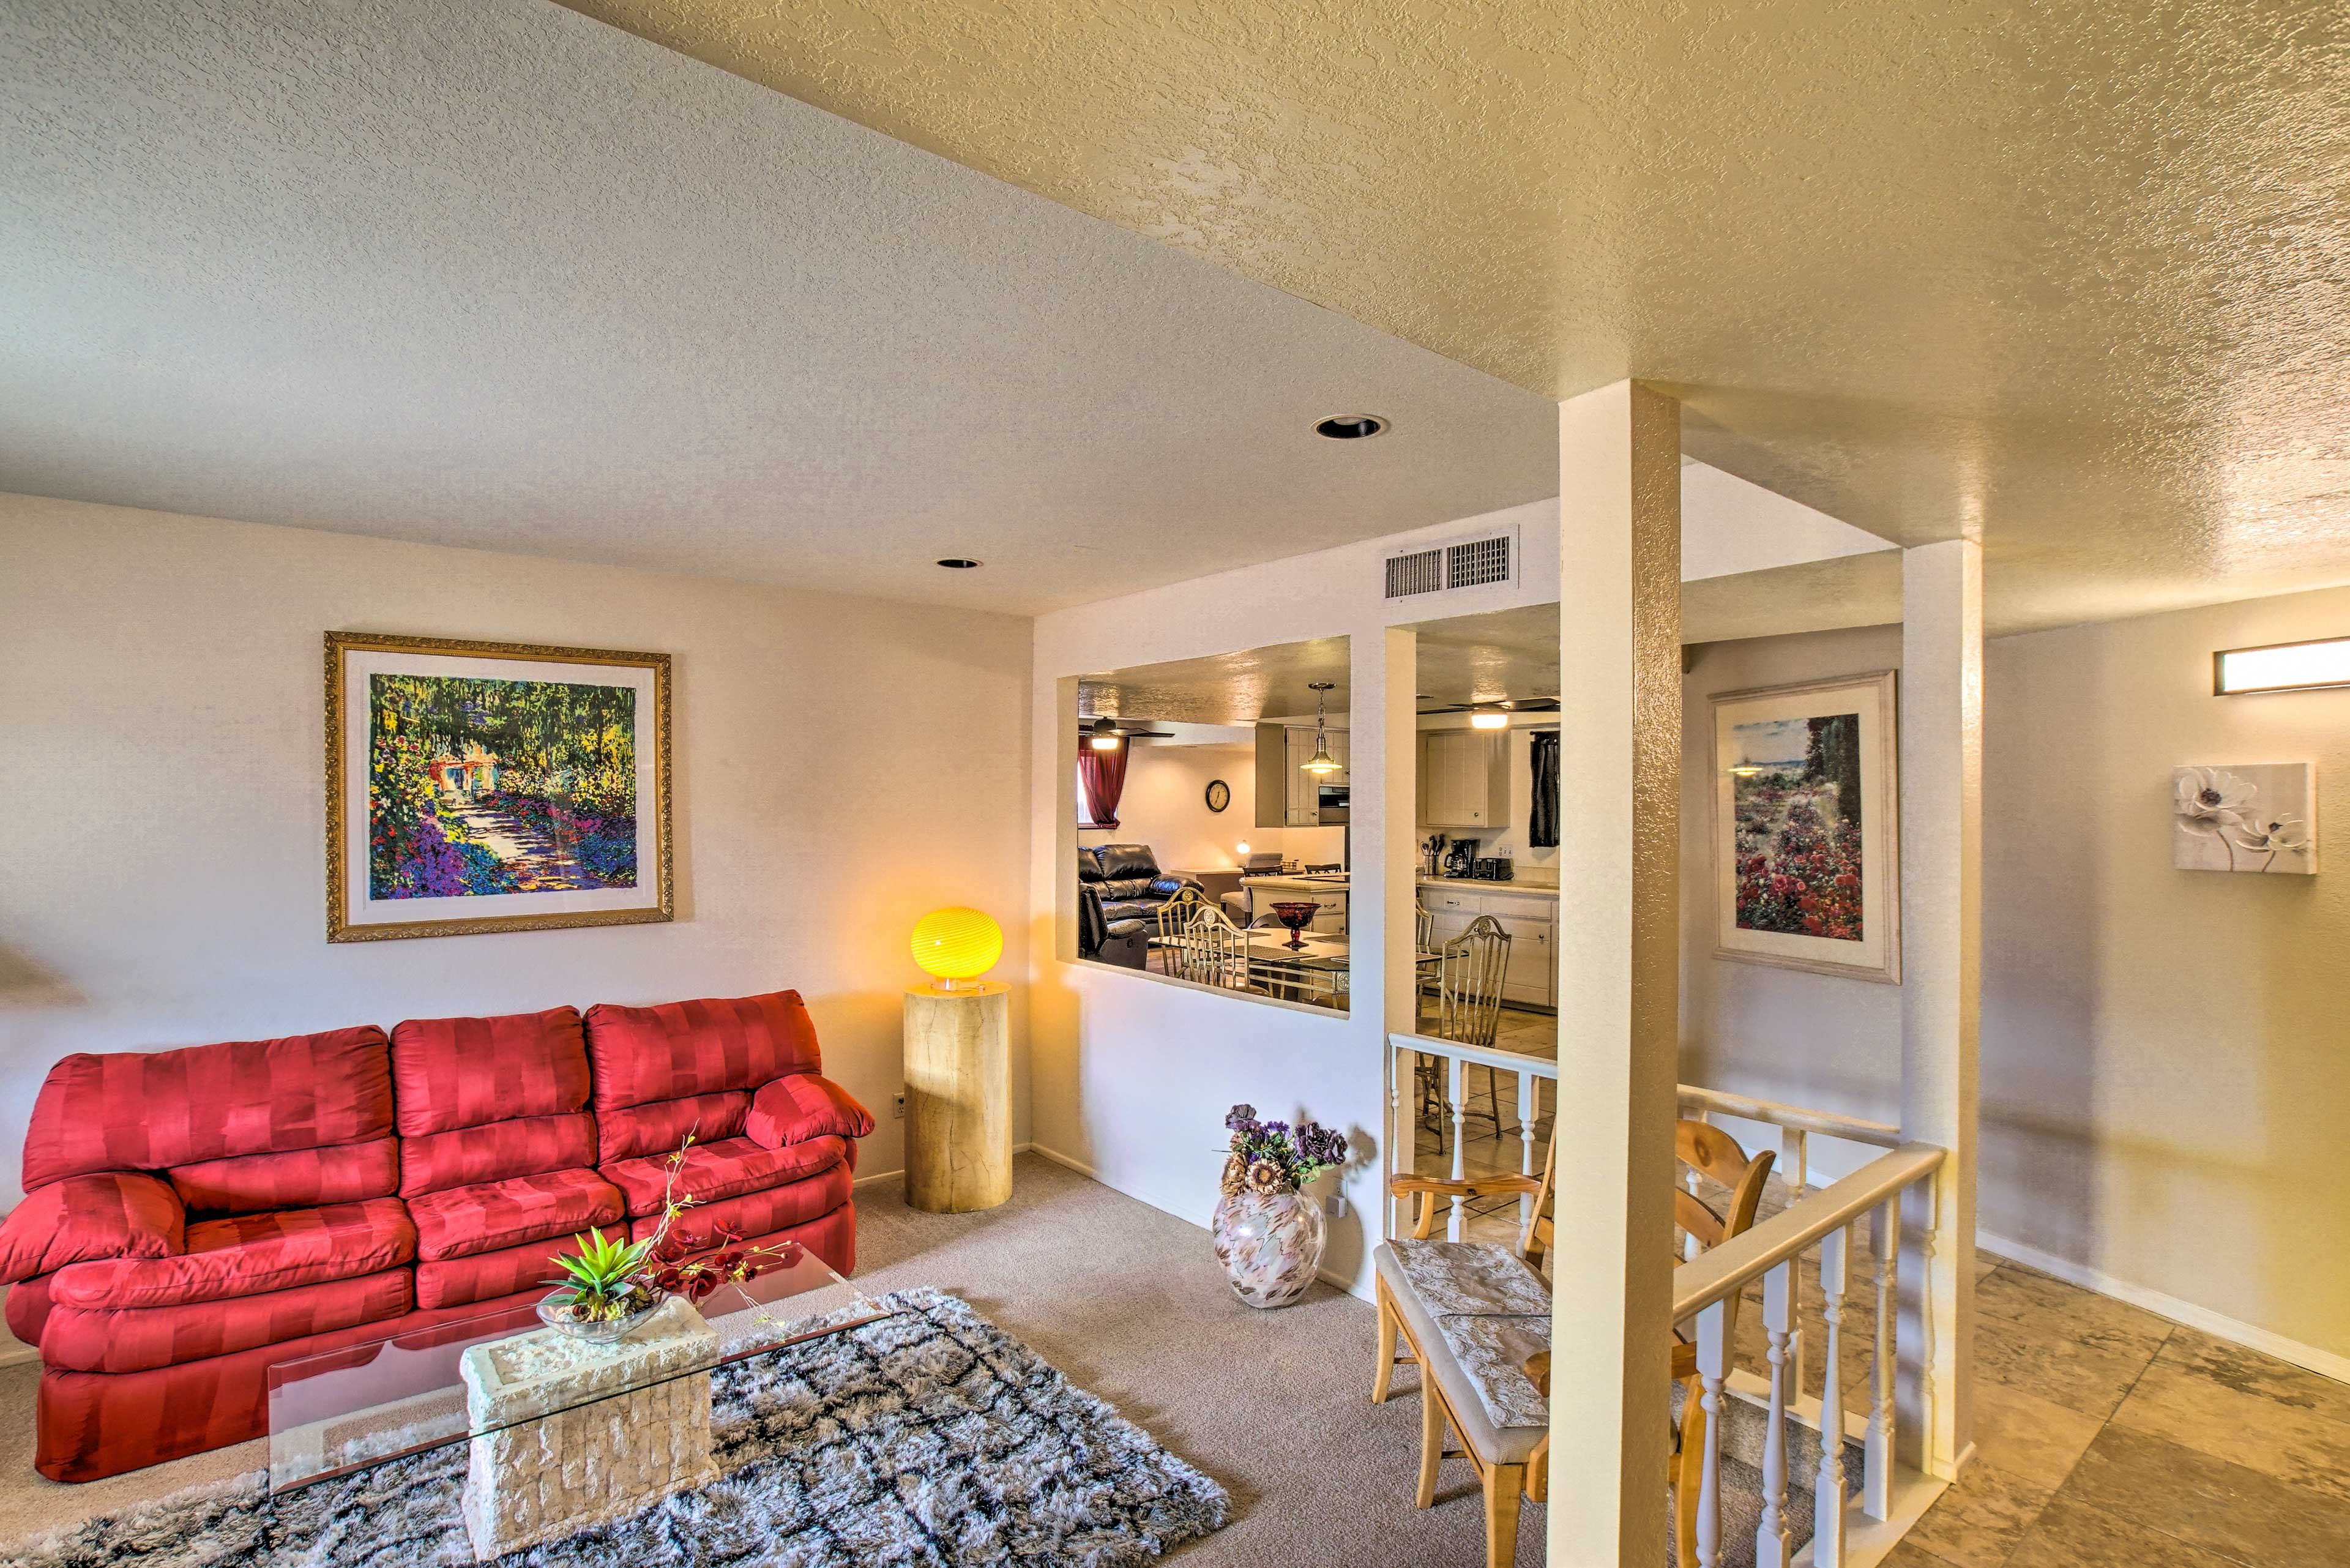 Property Interior | Entryway | Free WiFi